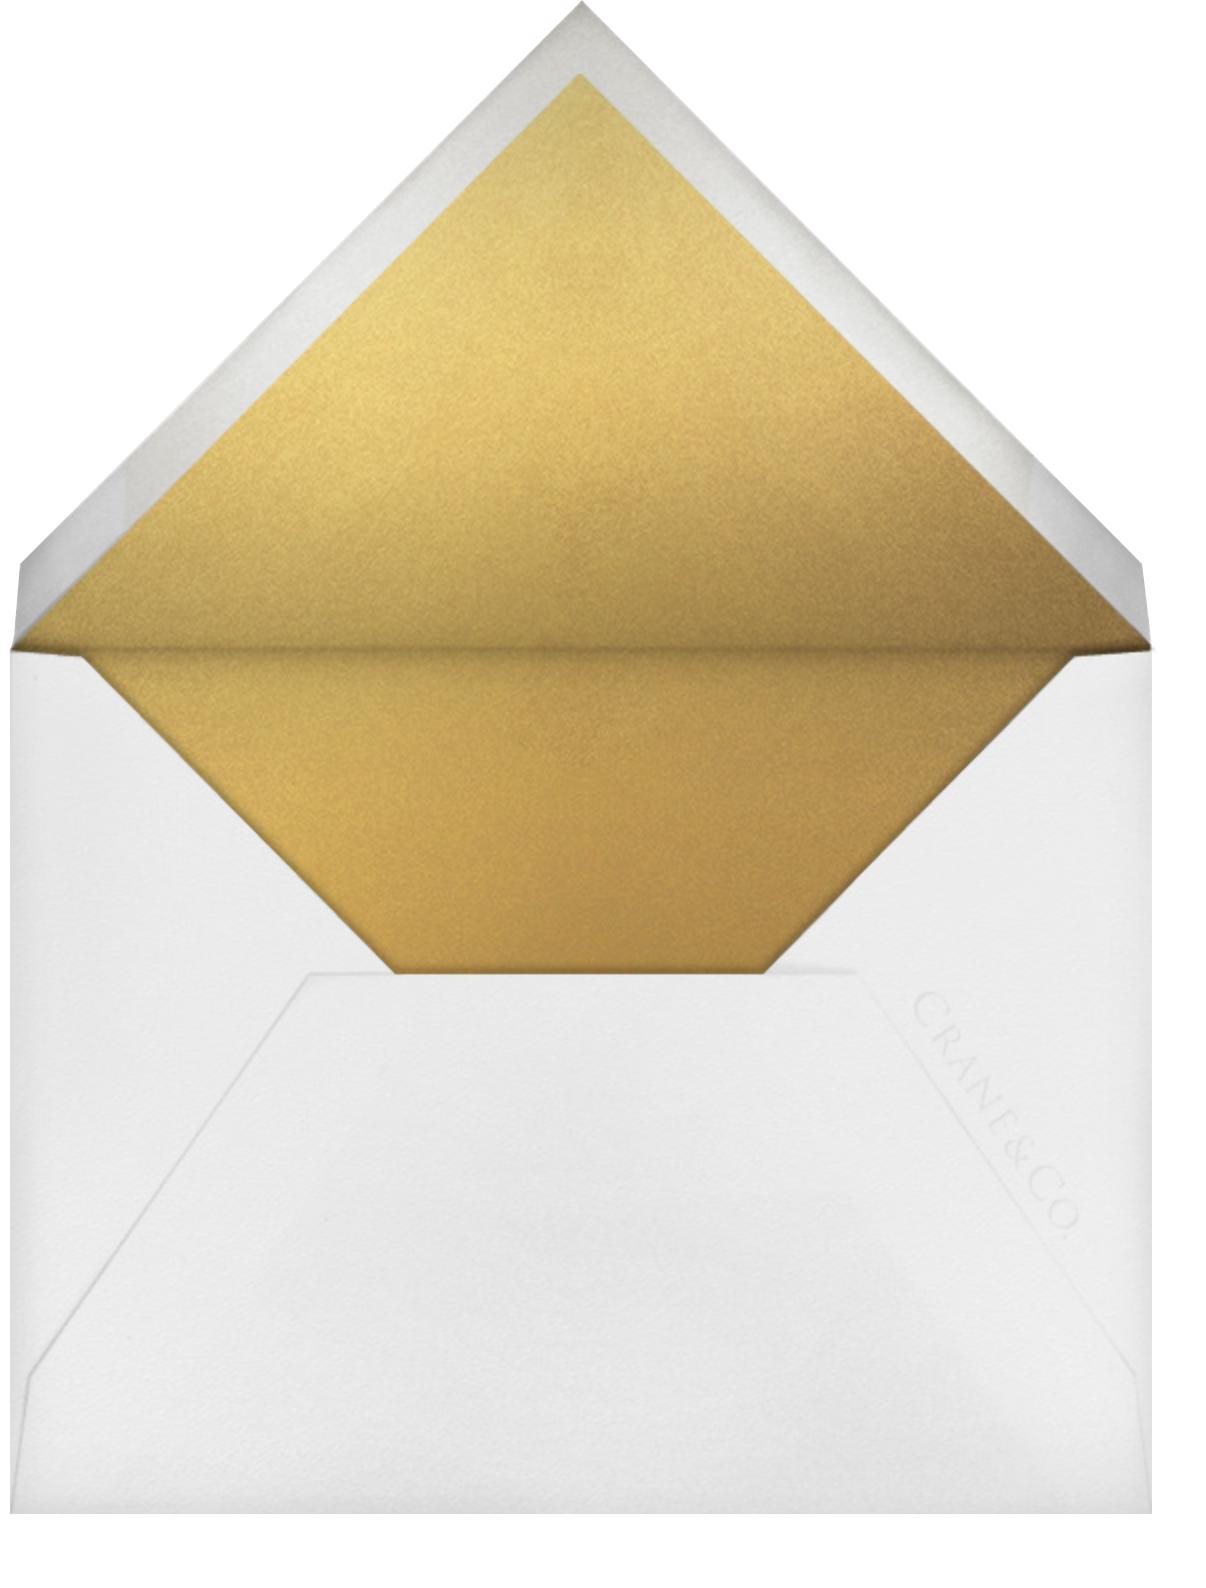 Polka Dot - Medium Gold - Oscar de la Renta - Holiday party - envelope back